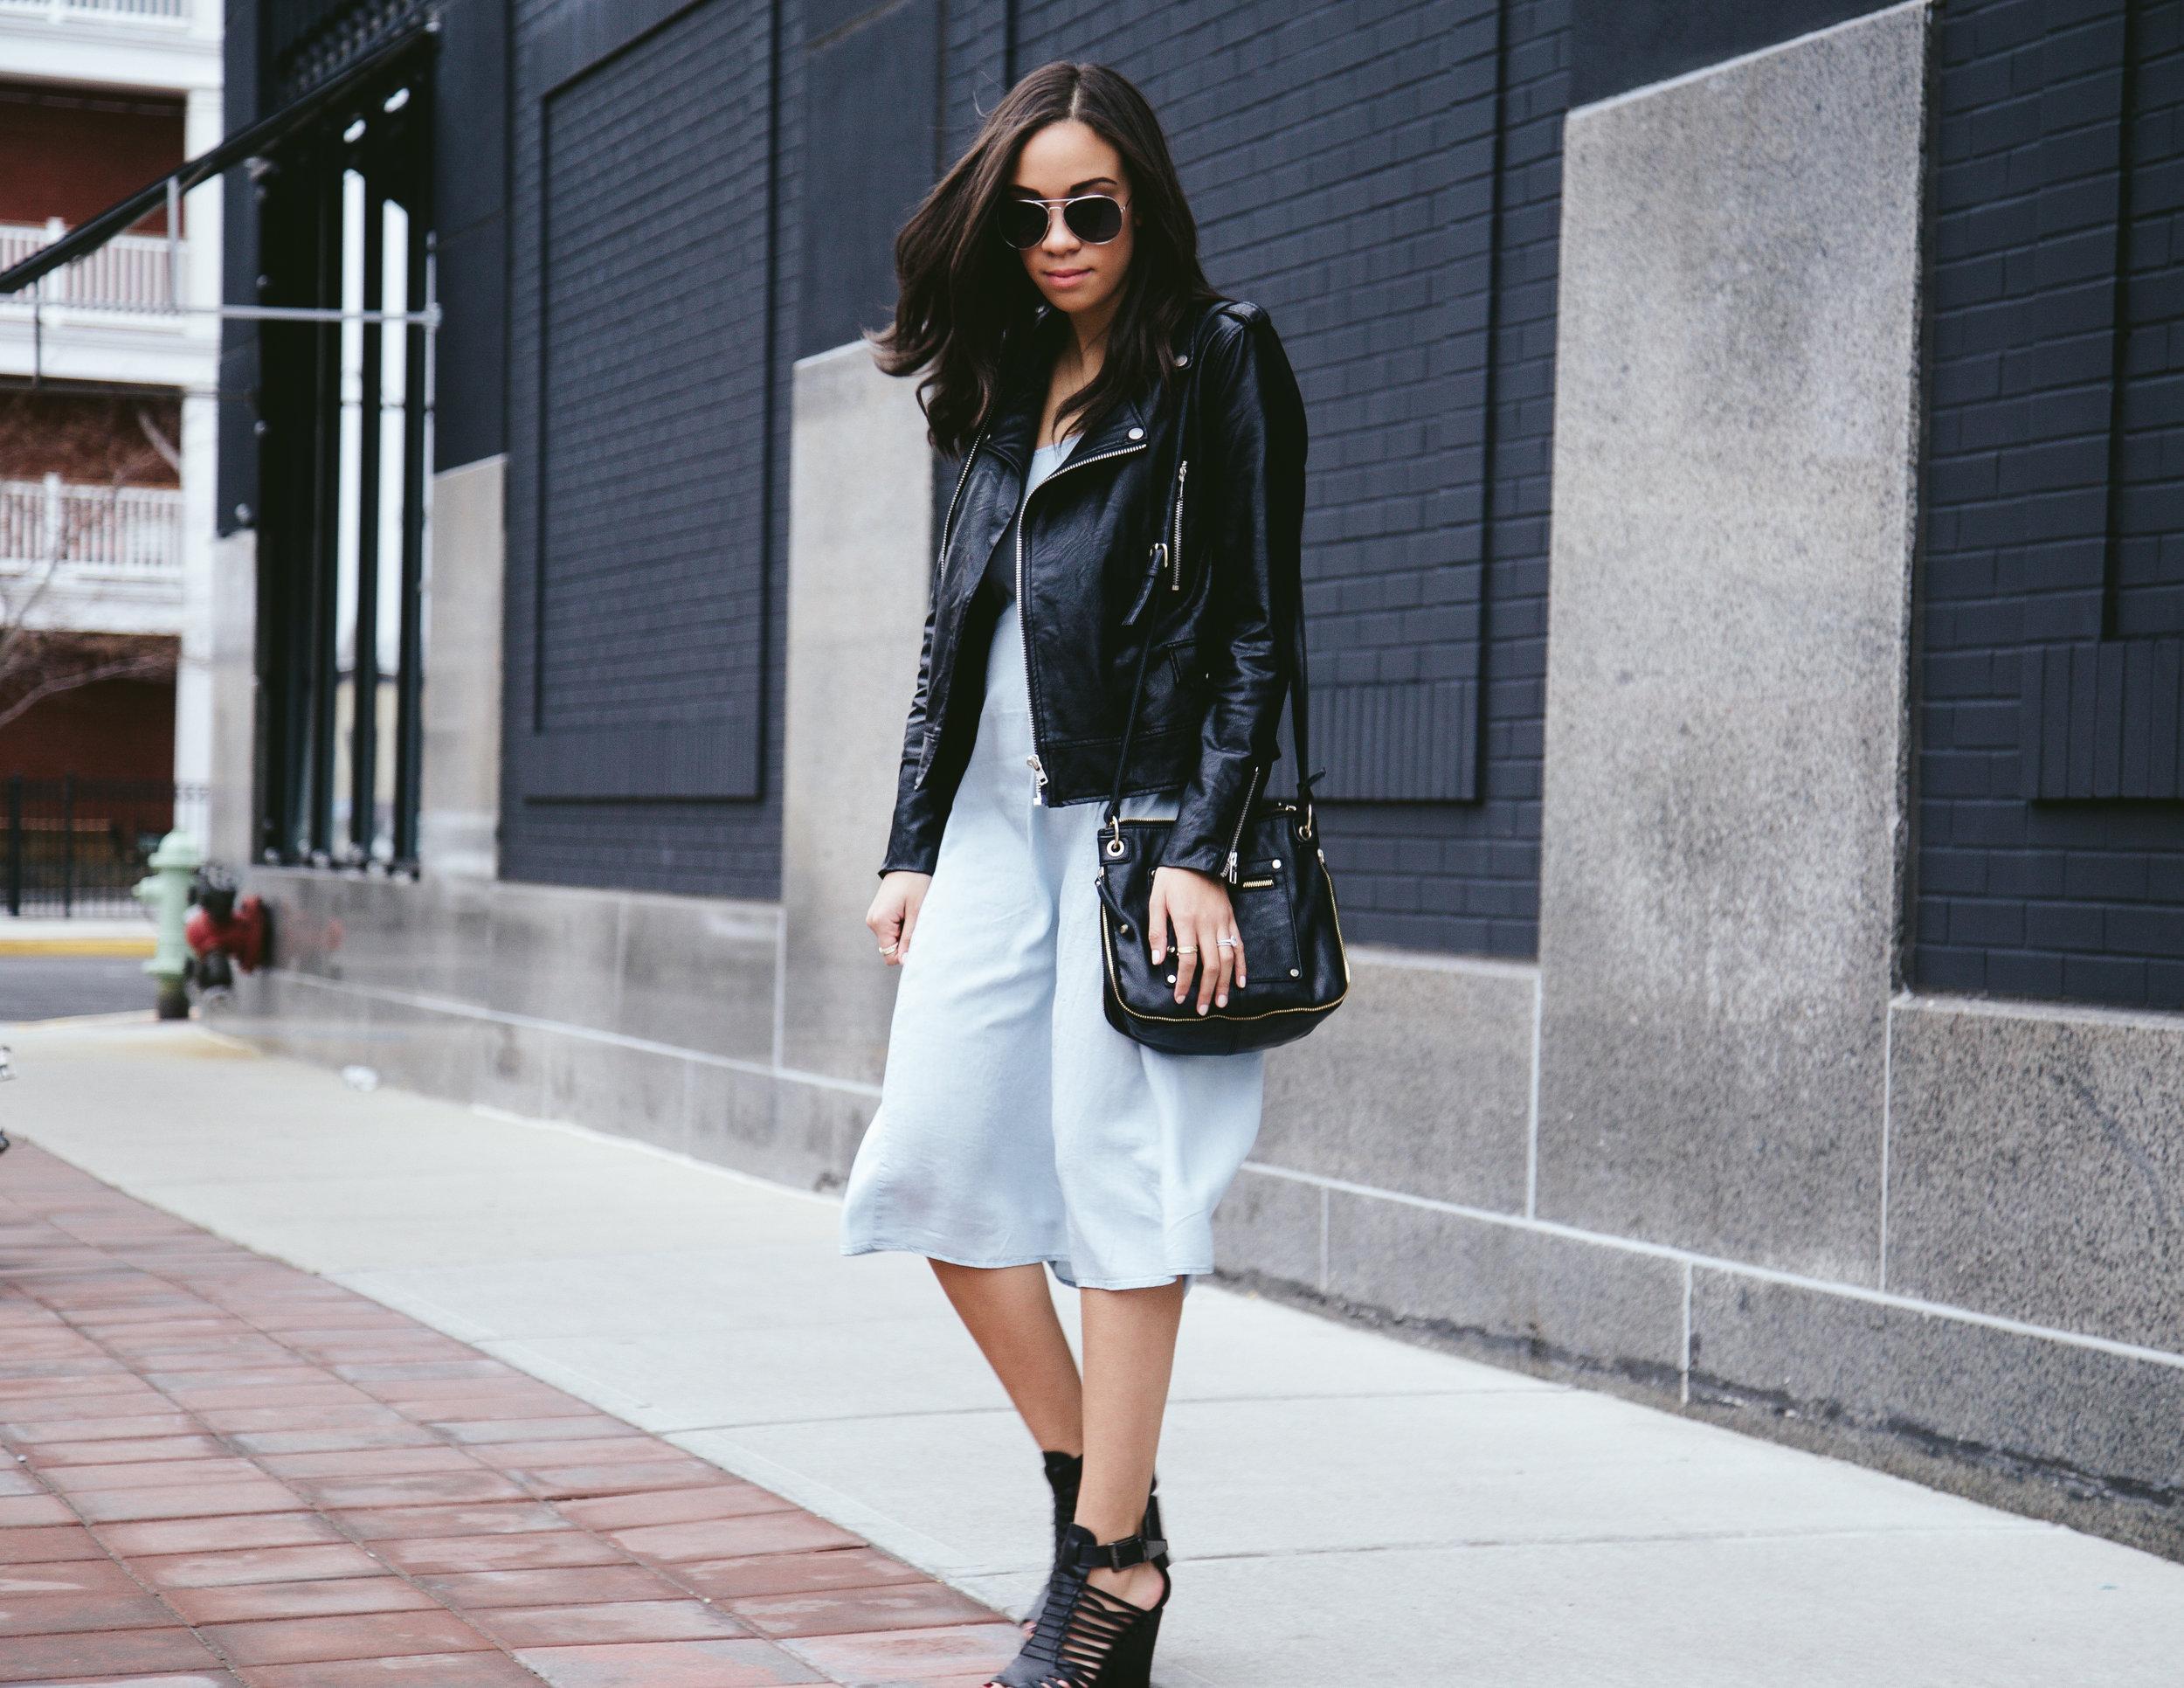 Spring Denim Dress + Faux Leather Jacket 2.jpg